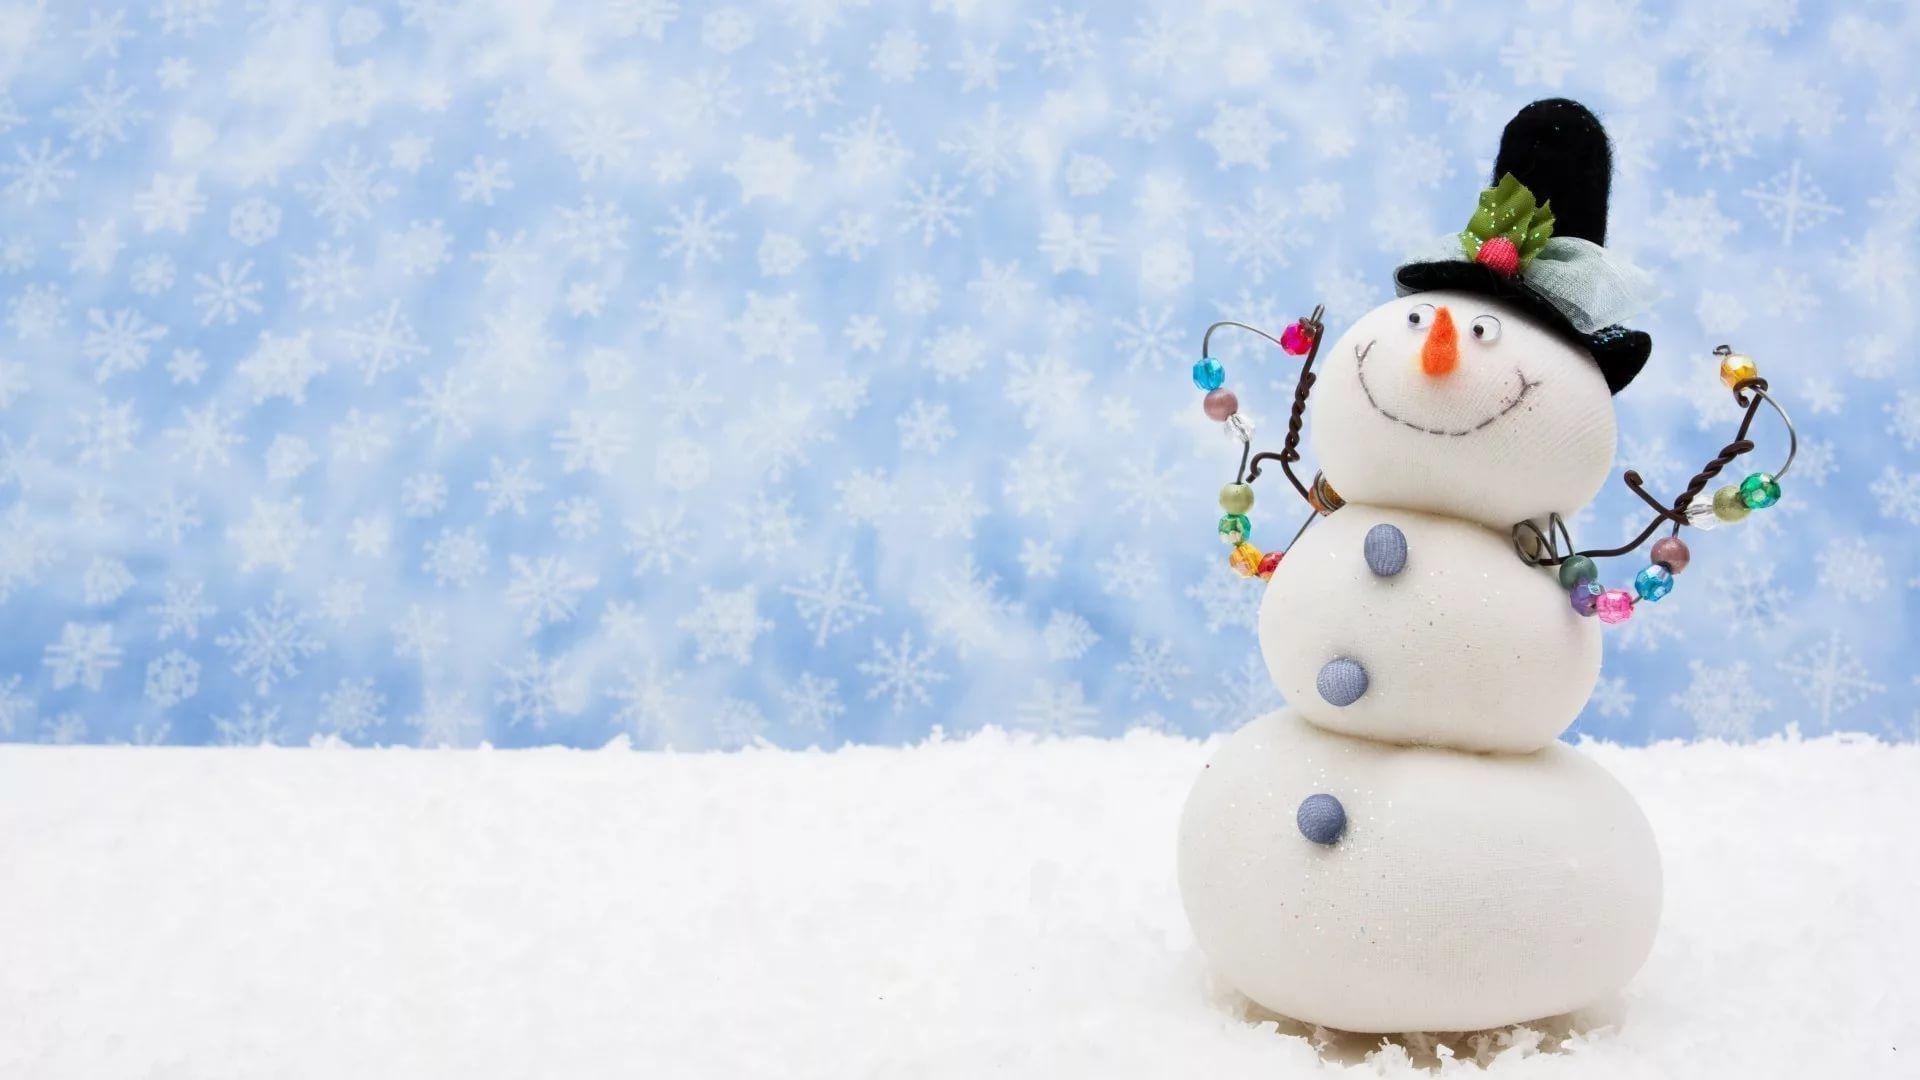 Cute Winter Free Download Wallpaper